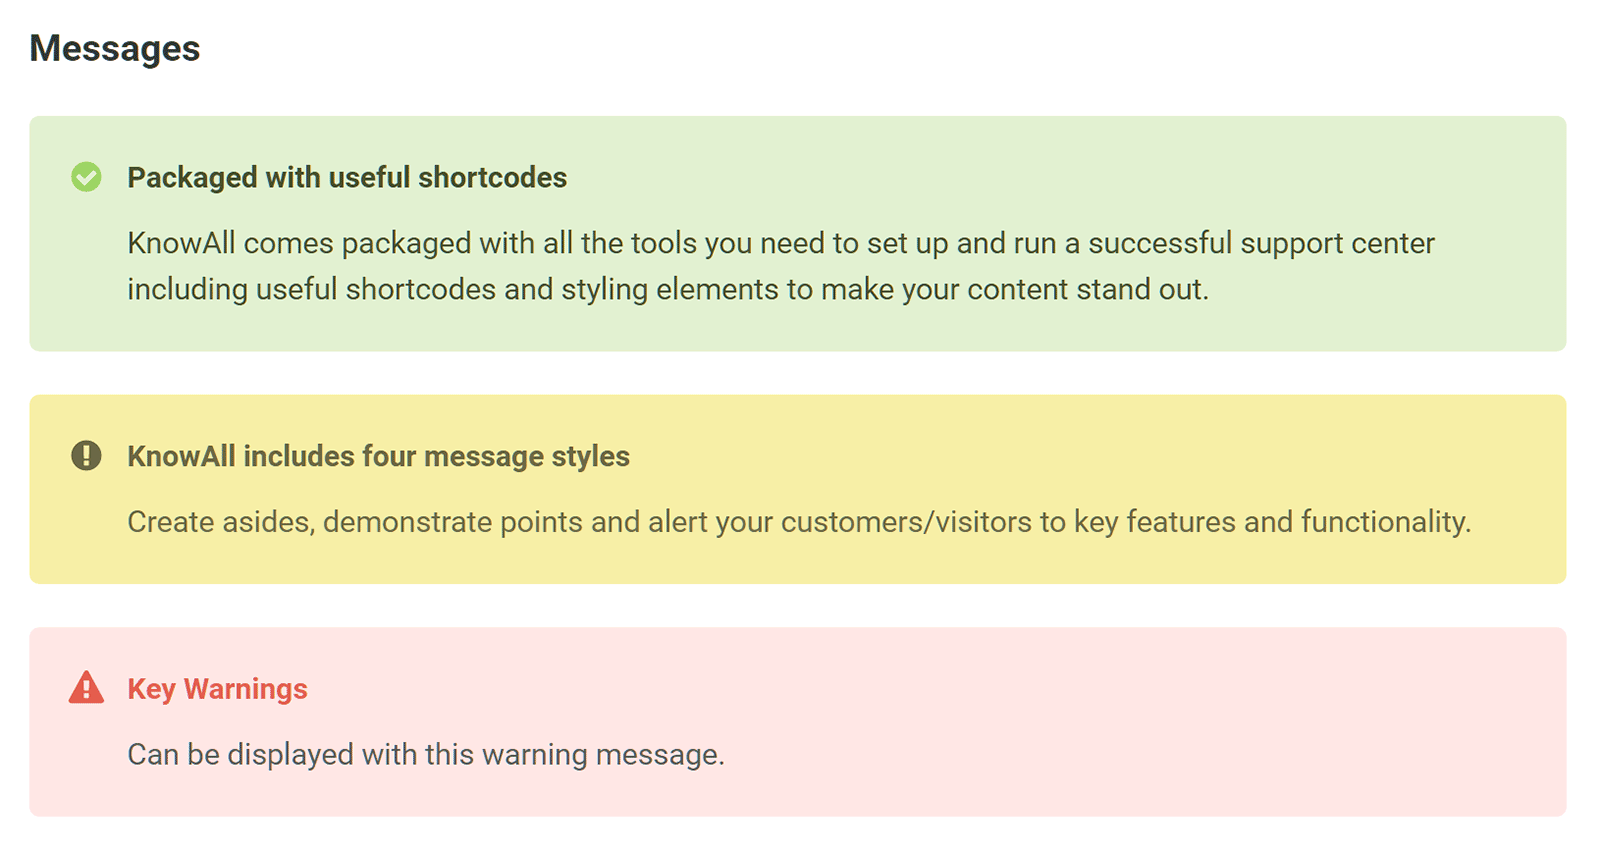 KnowAll Alerts